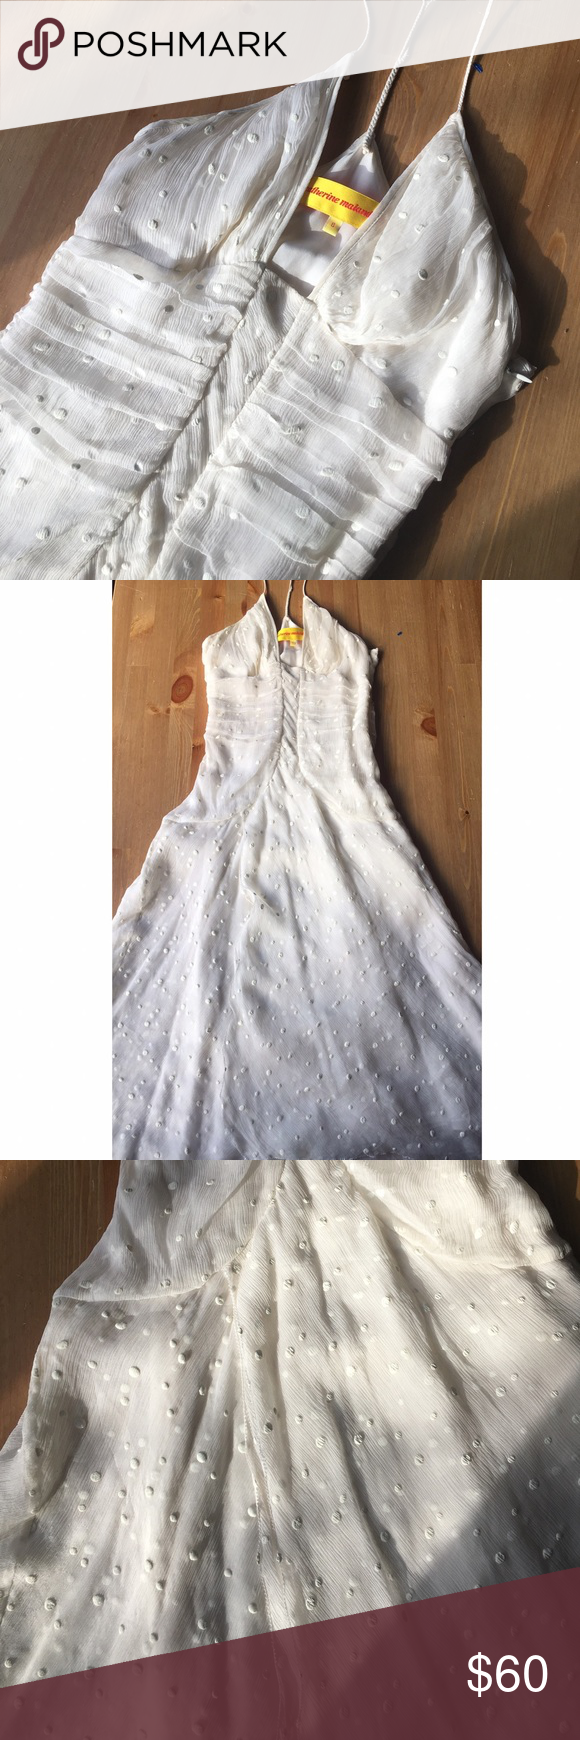 Catherine malandrino white dot halter dress catherine malandrino